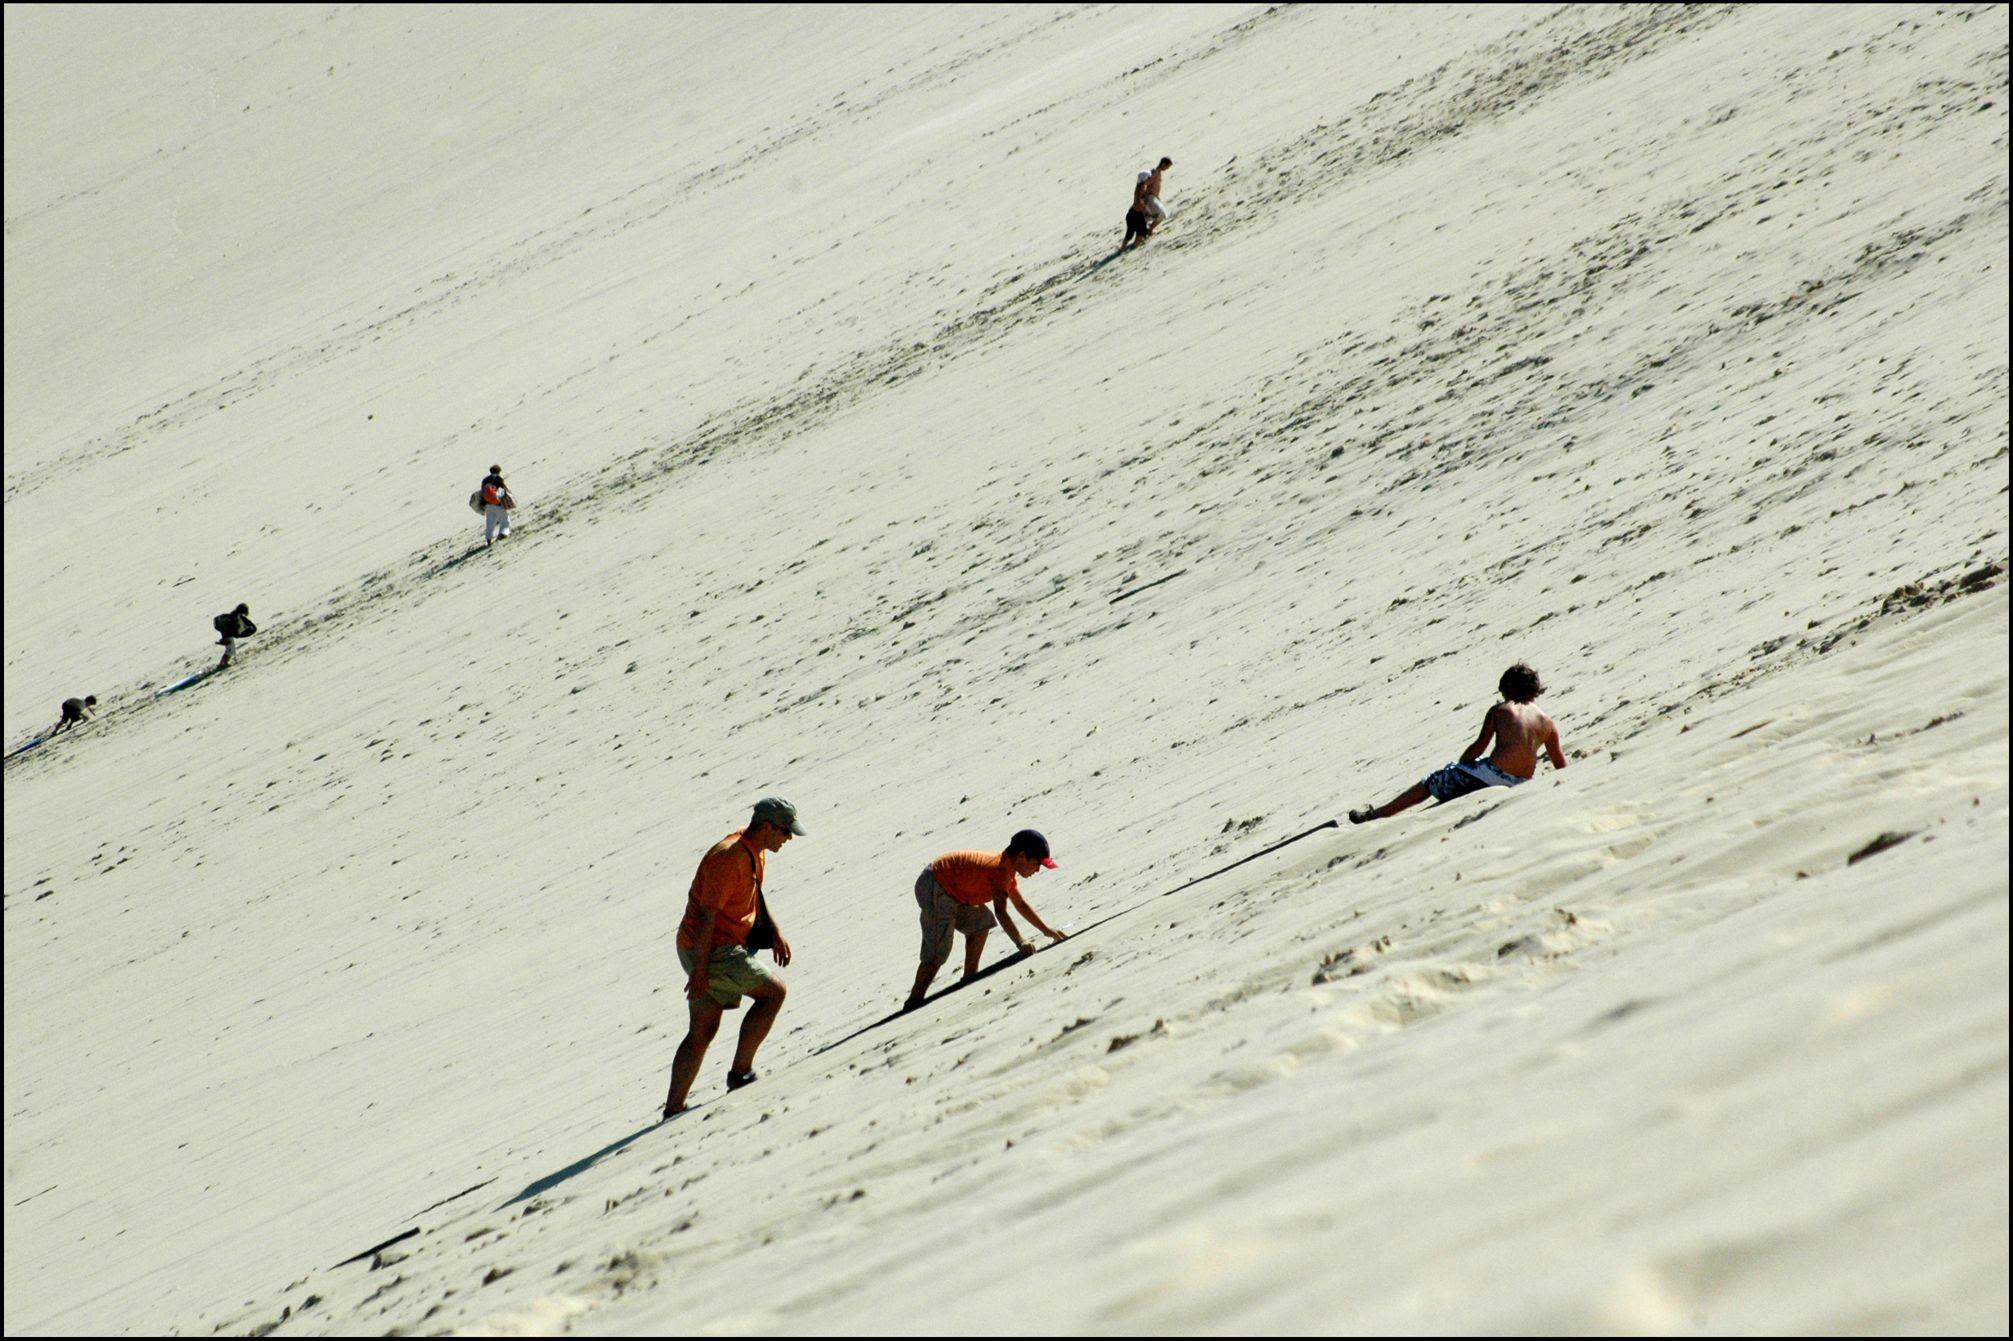 wMB0z Dune de Pyla   A new Sahara desert being born   in France! [30 pics]